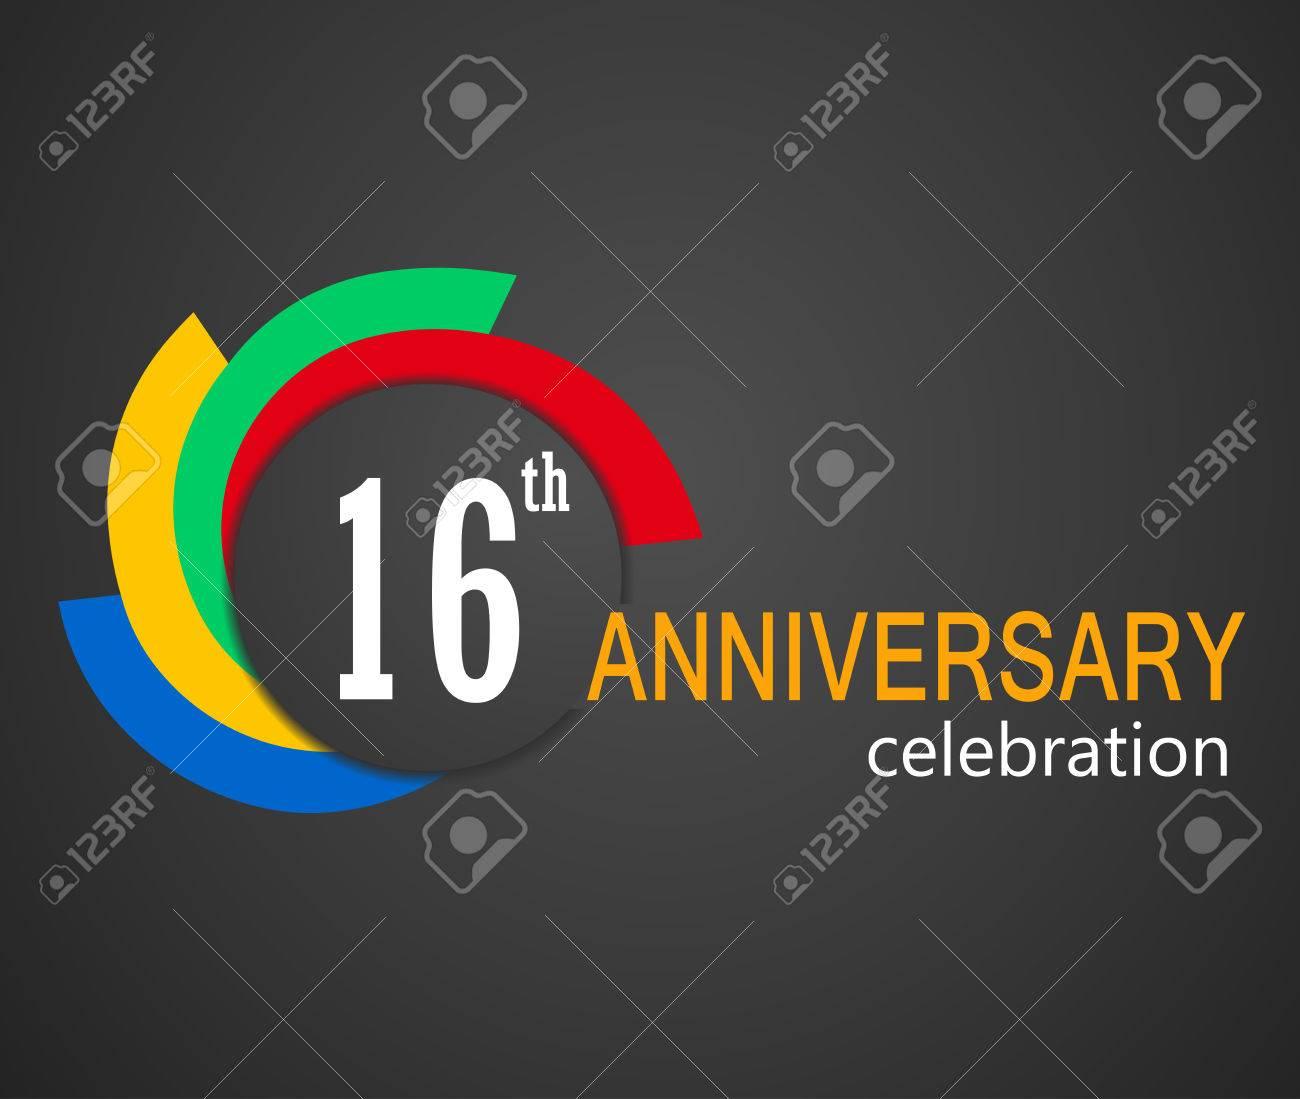 b95c4f509b4ea 16th Anniversary Celebration Background